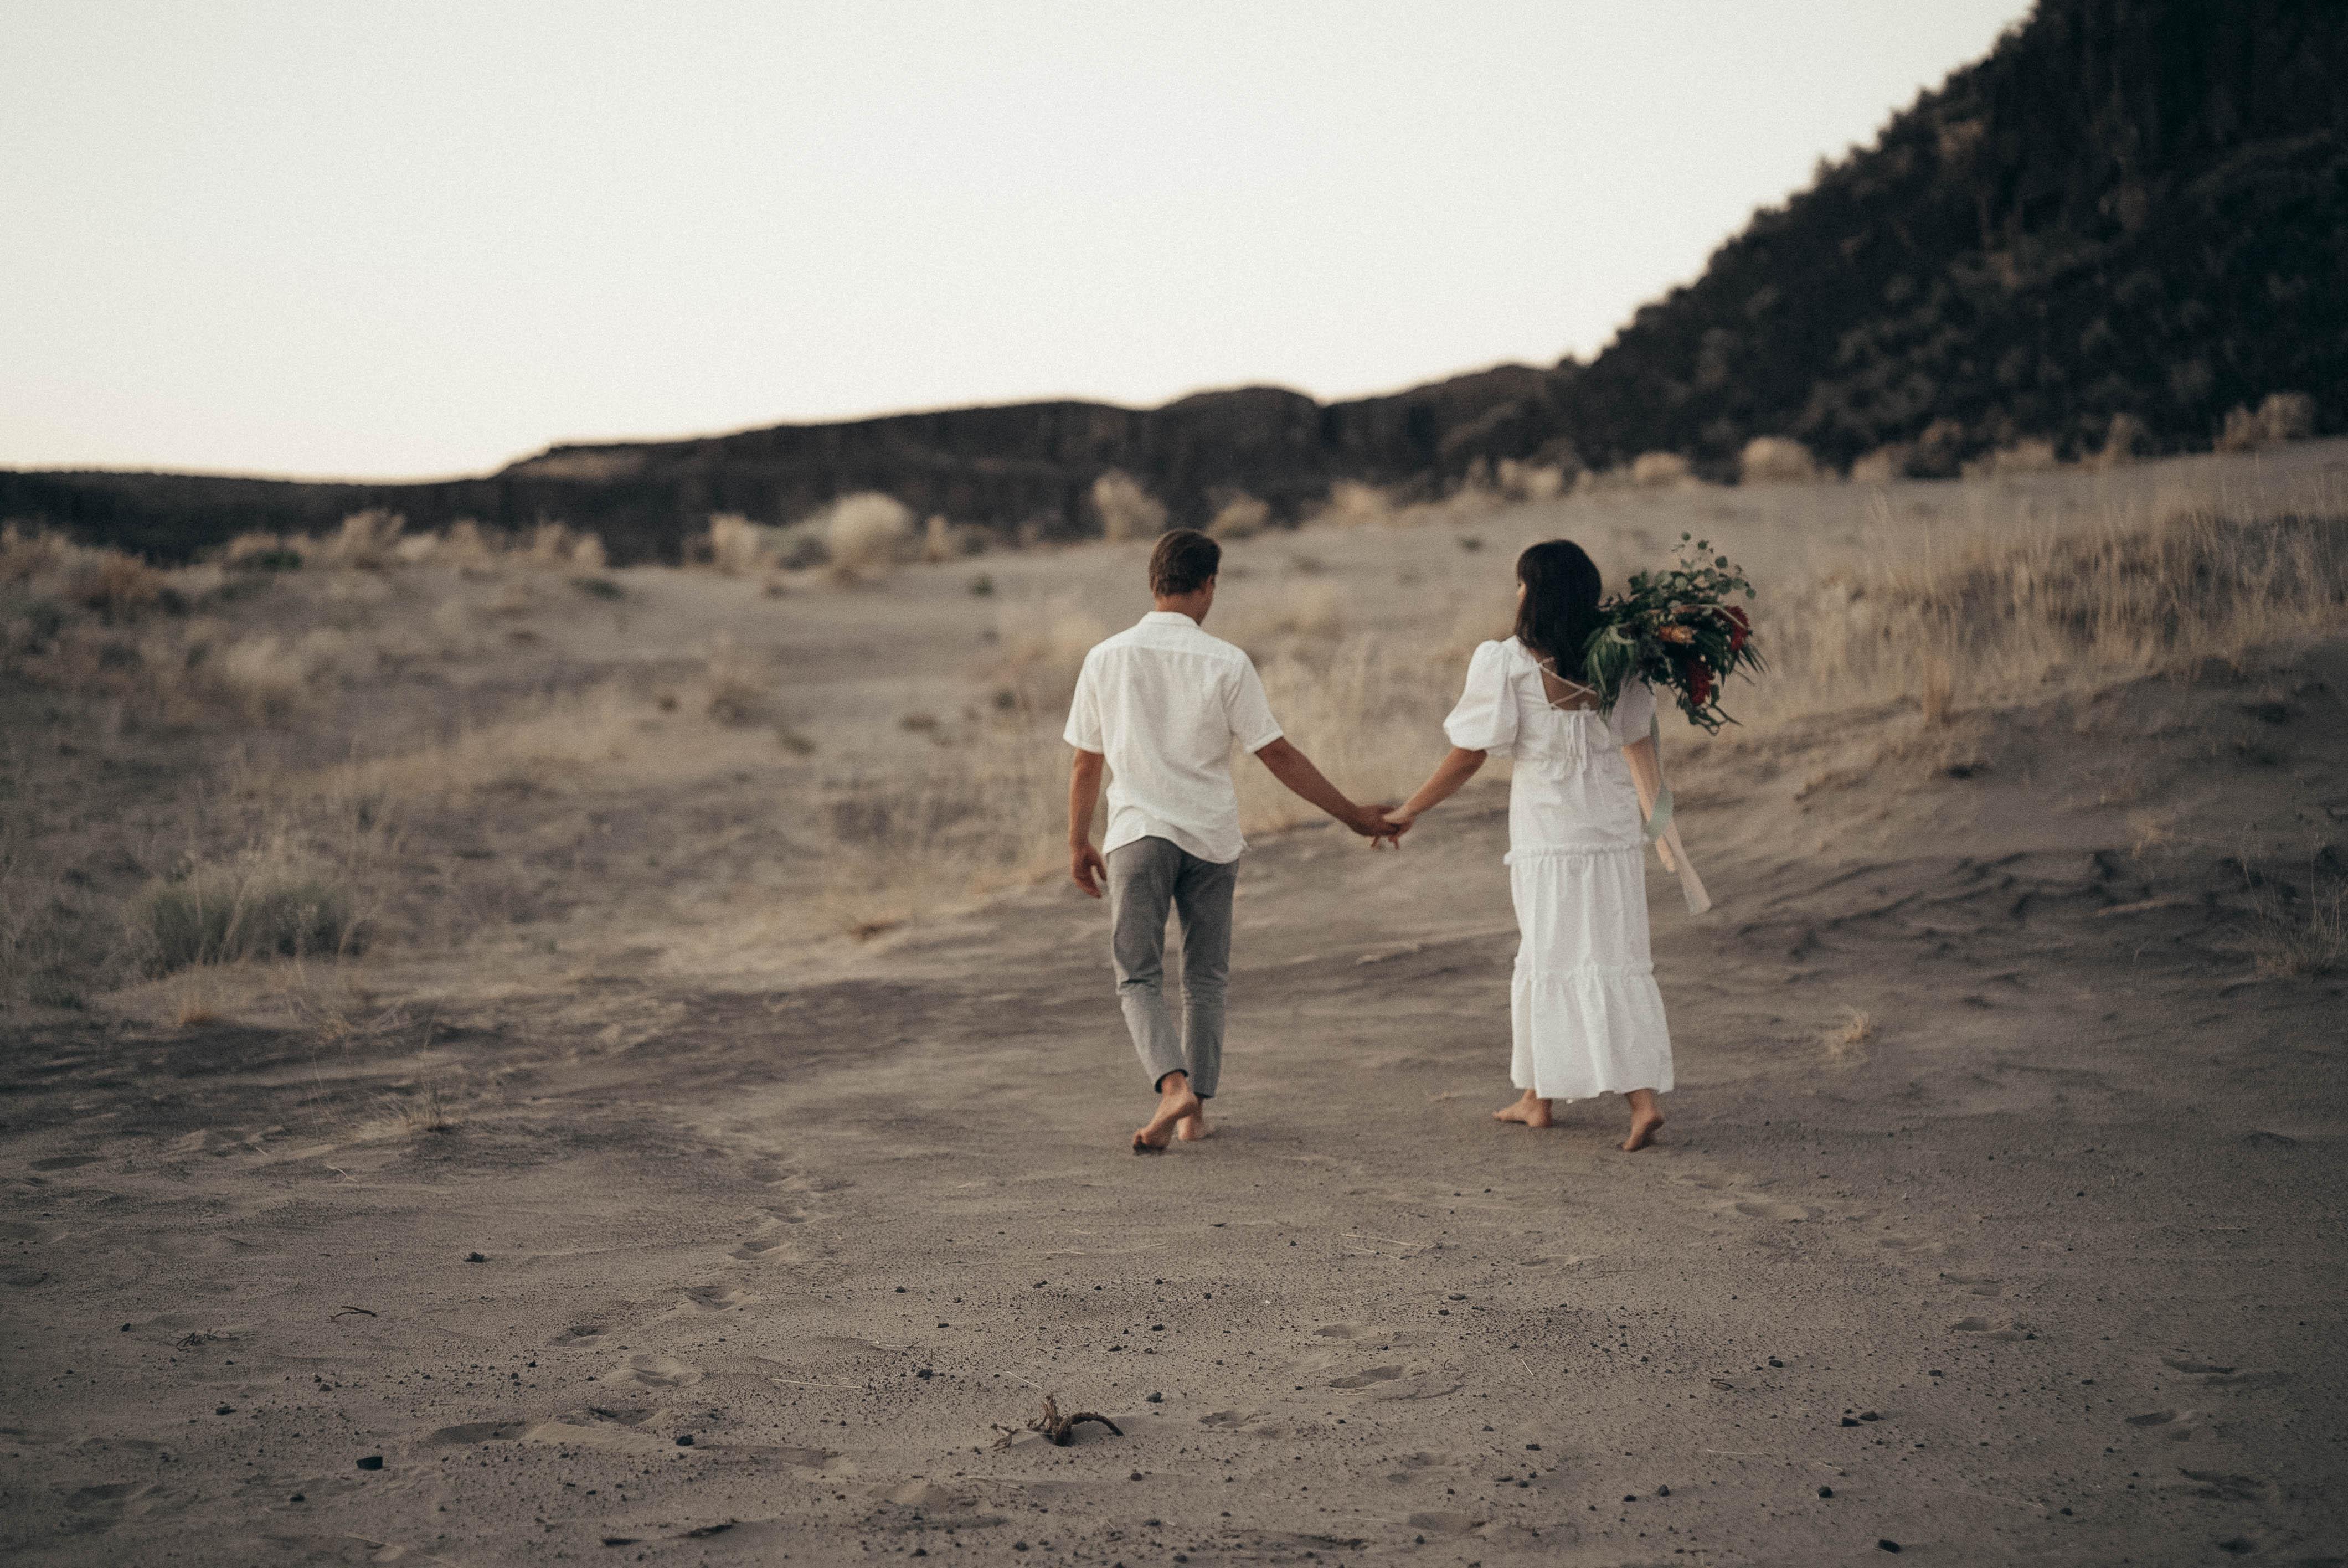 unrecognizable wedding barefoot couple walking on sandy terrain